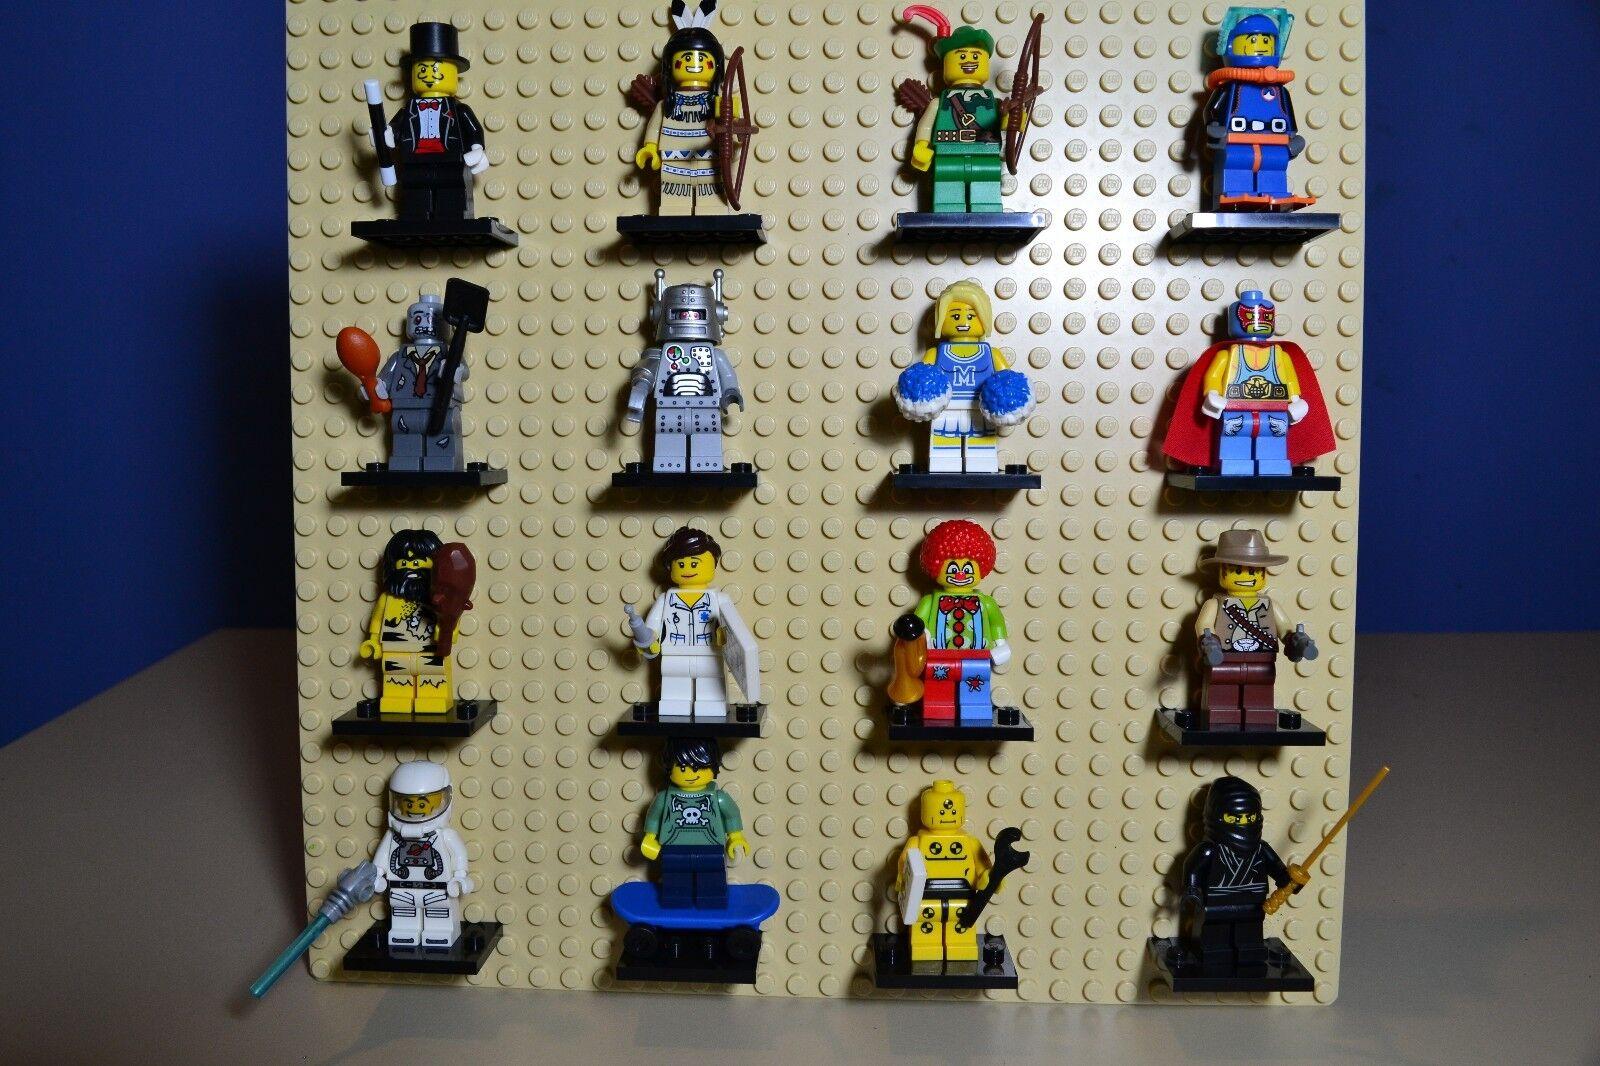 Minifiguras Lego Serie 1 (8683) juego completo de 16